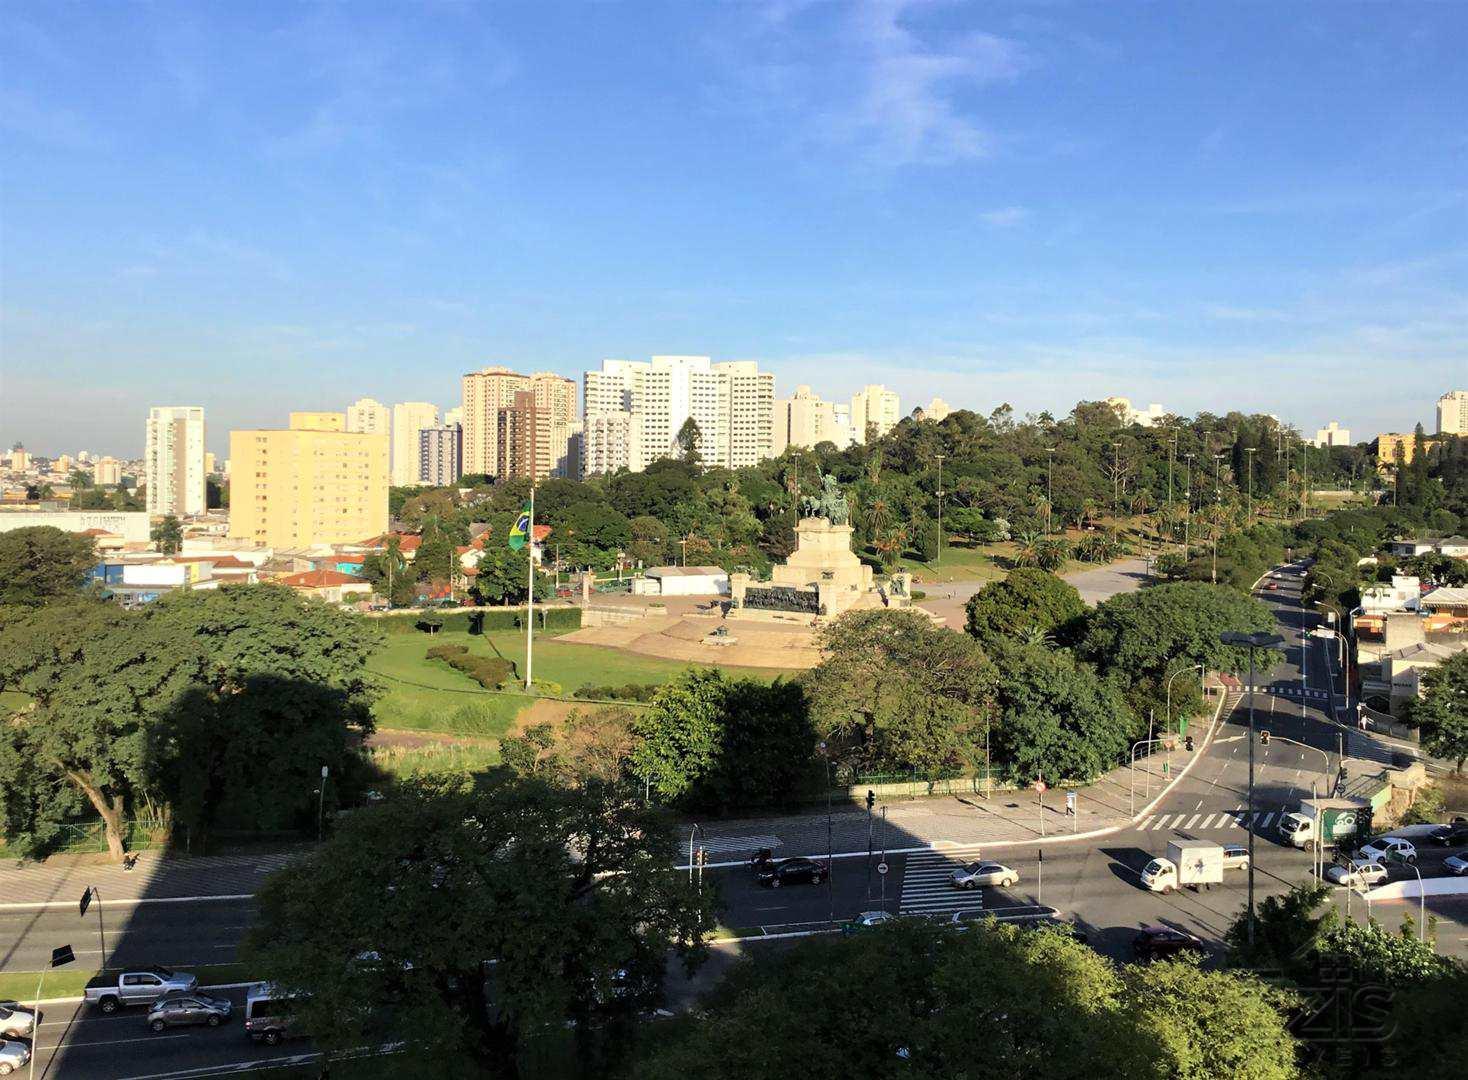 Apartamento com 4 dorms, Vila Monumento, São Paulo - R$ 898 mil, Cod: 4937